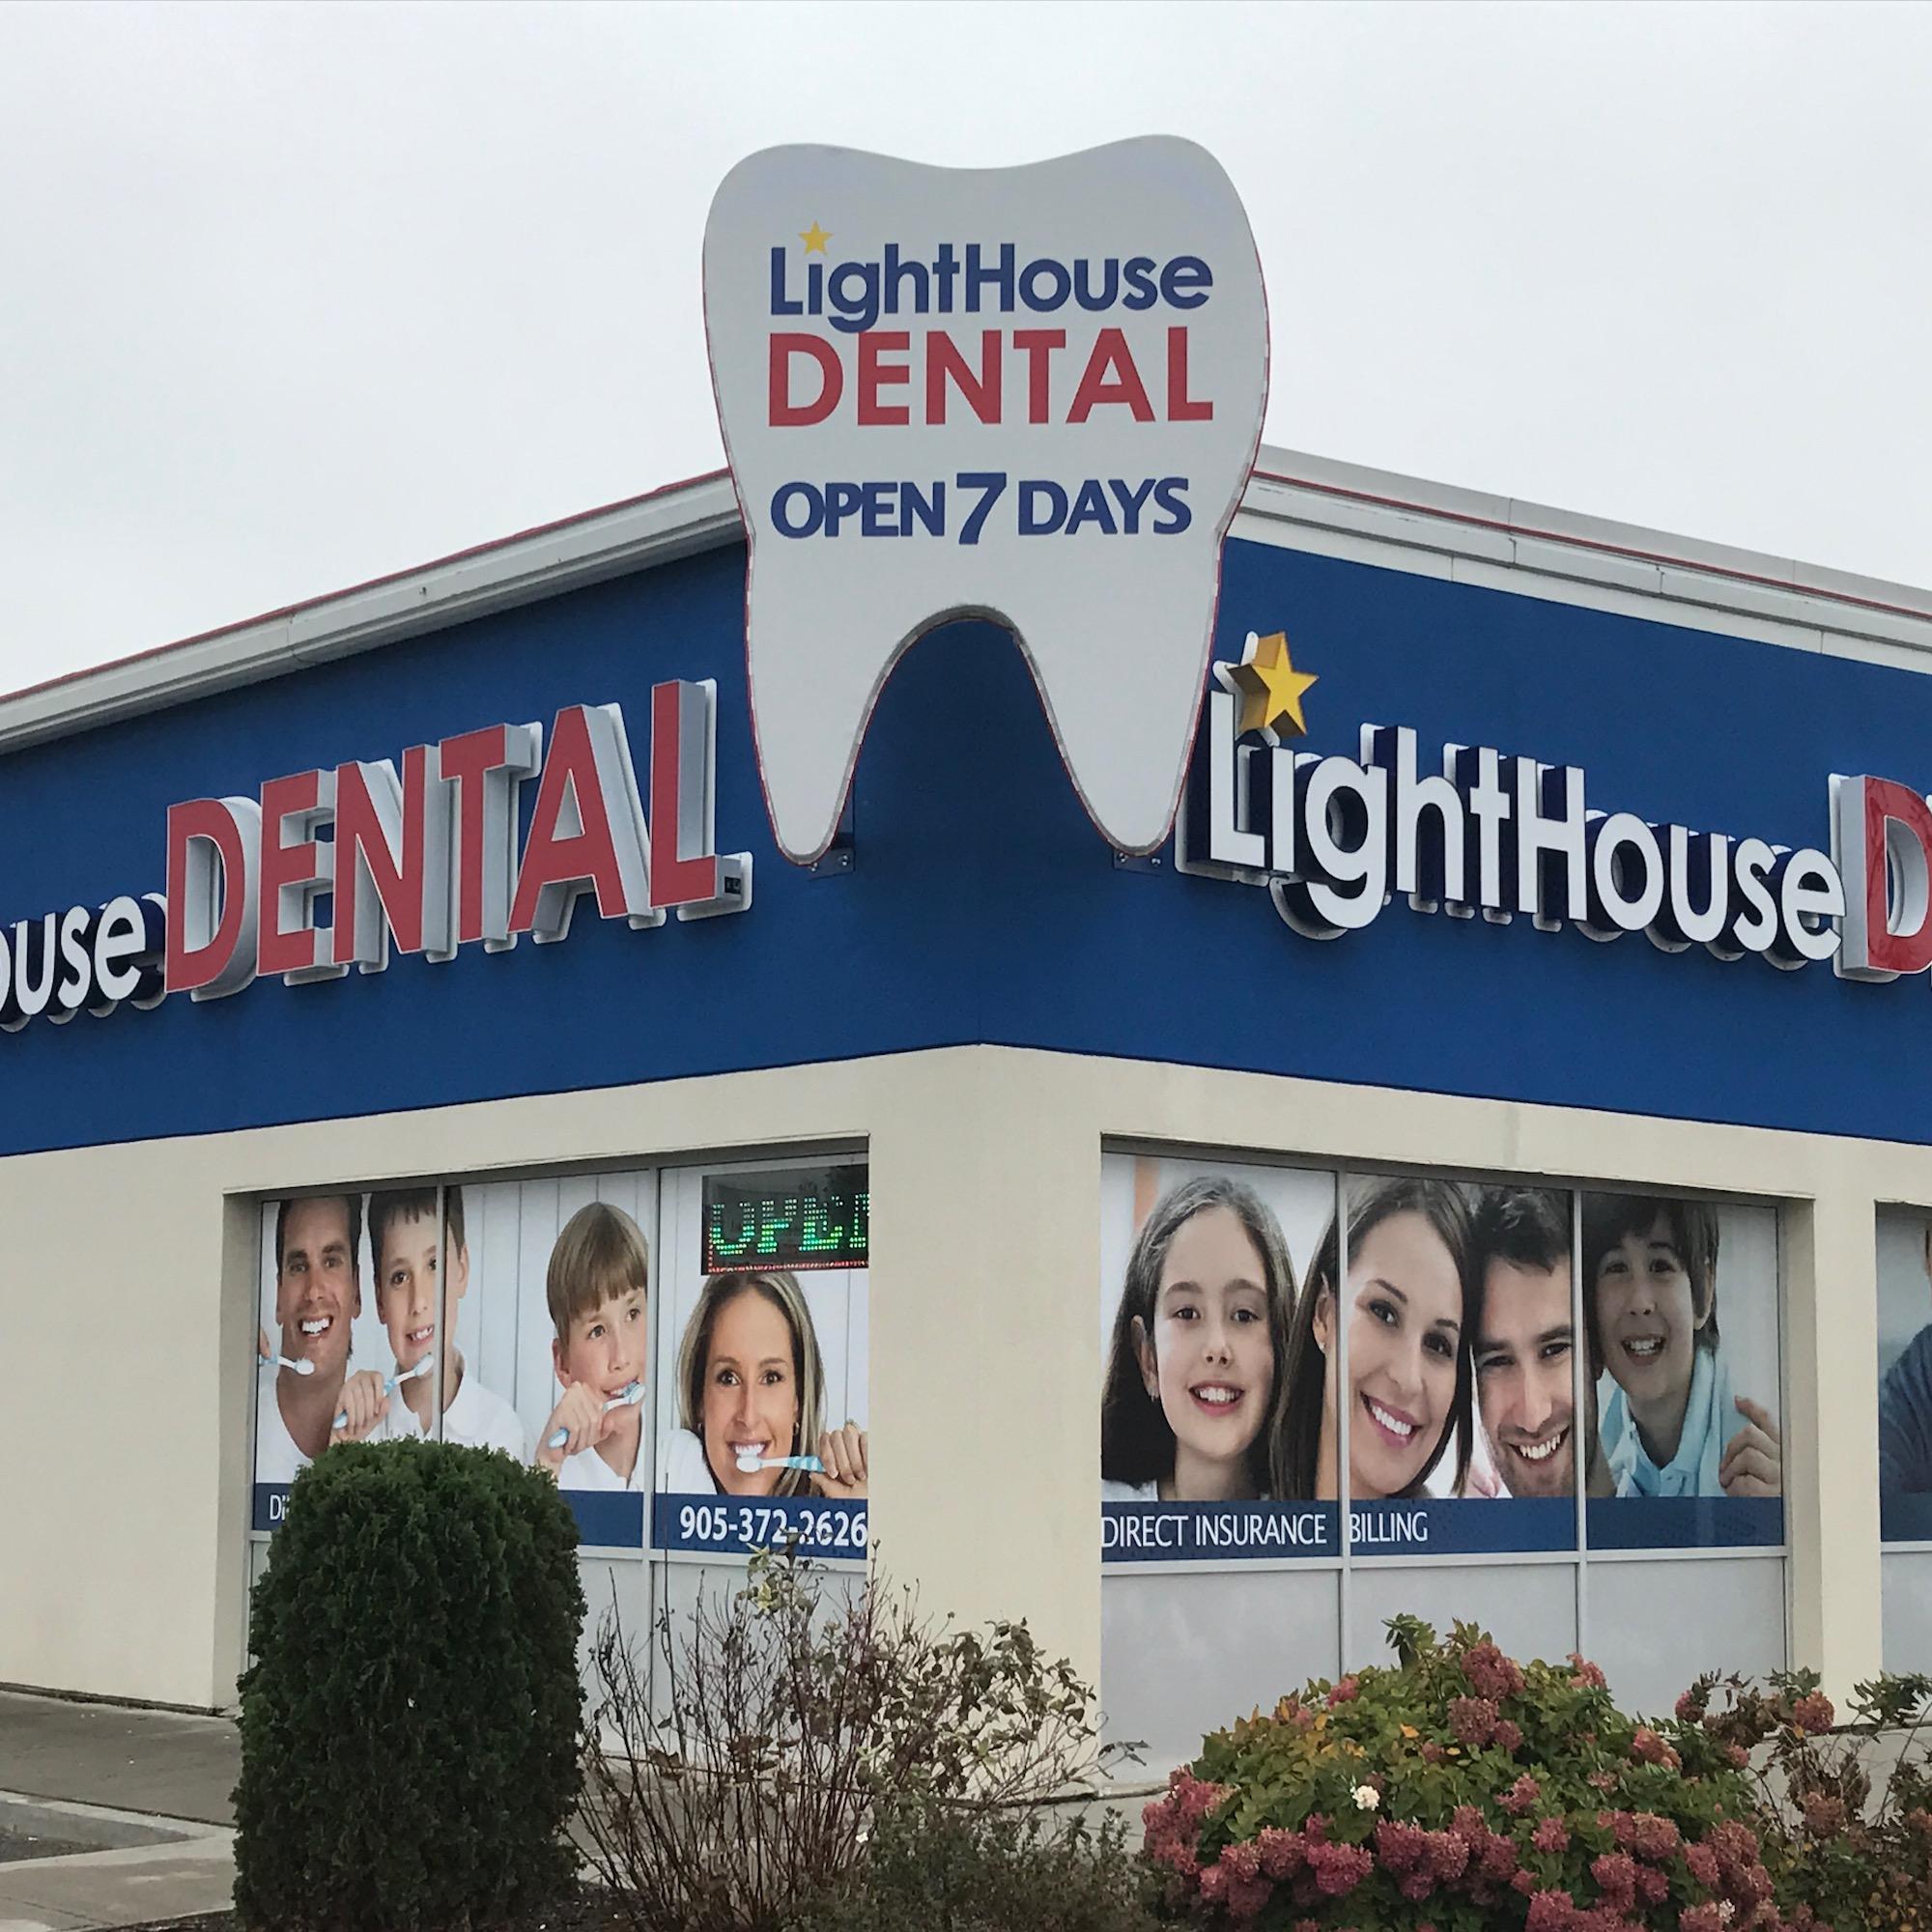 LightHouse Dental – Cobourg